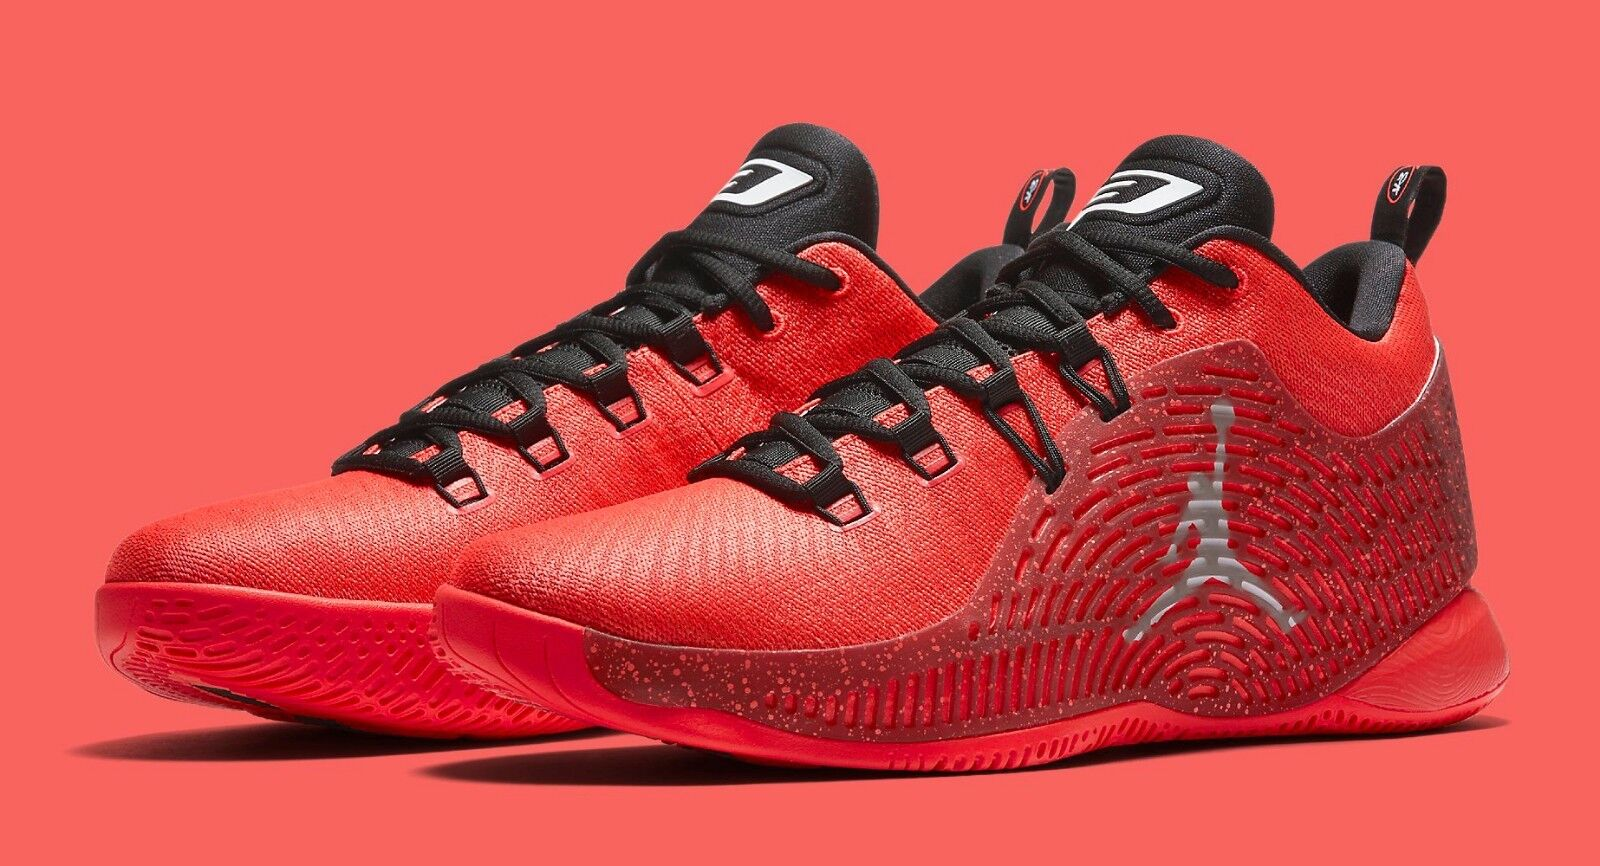 Air Jordan CP3.X 10 size 15. Infrared Black Red. 854294-600. Chris Paul.